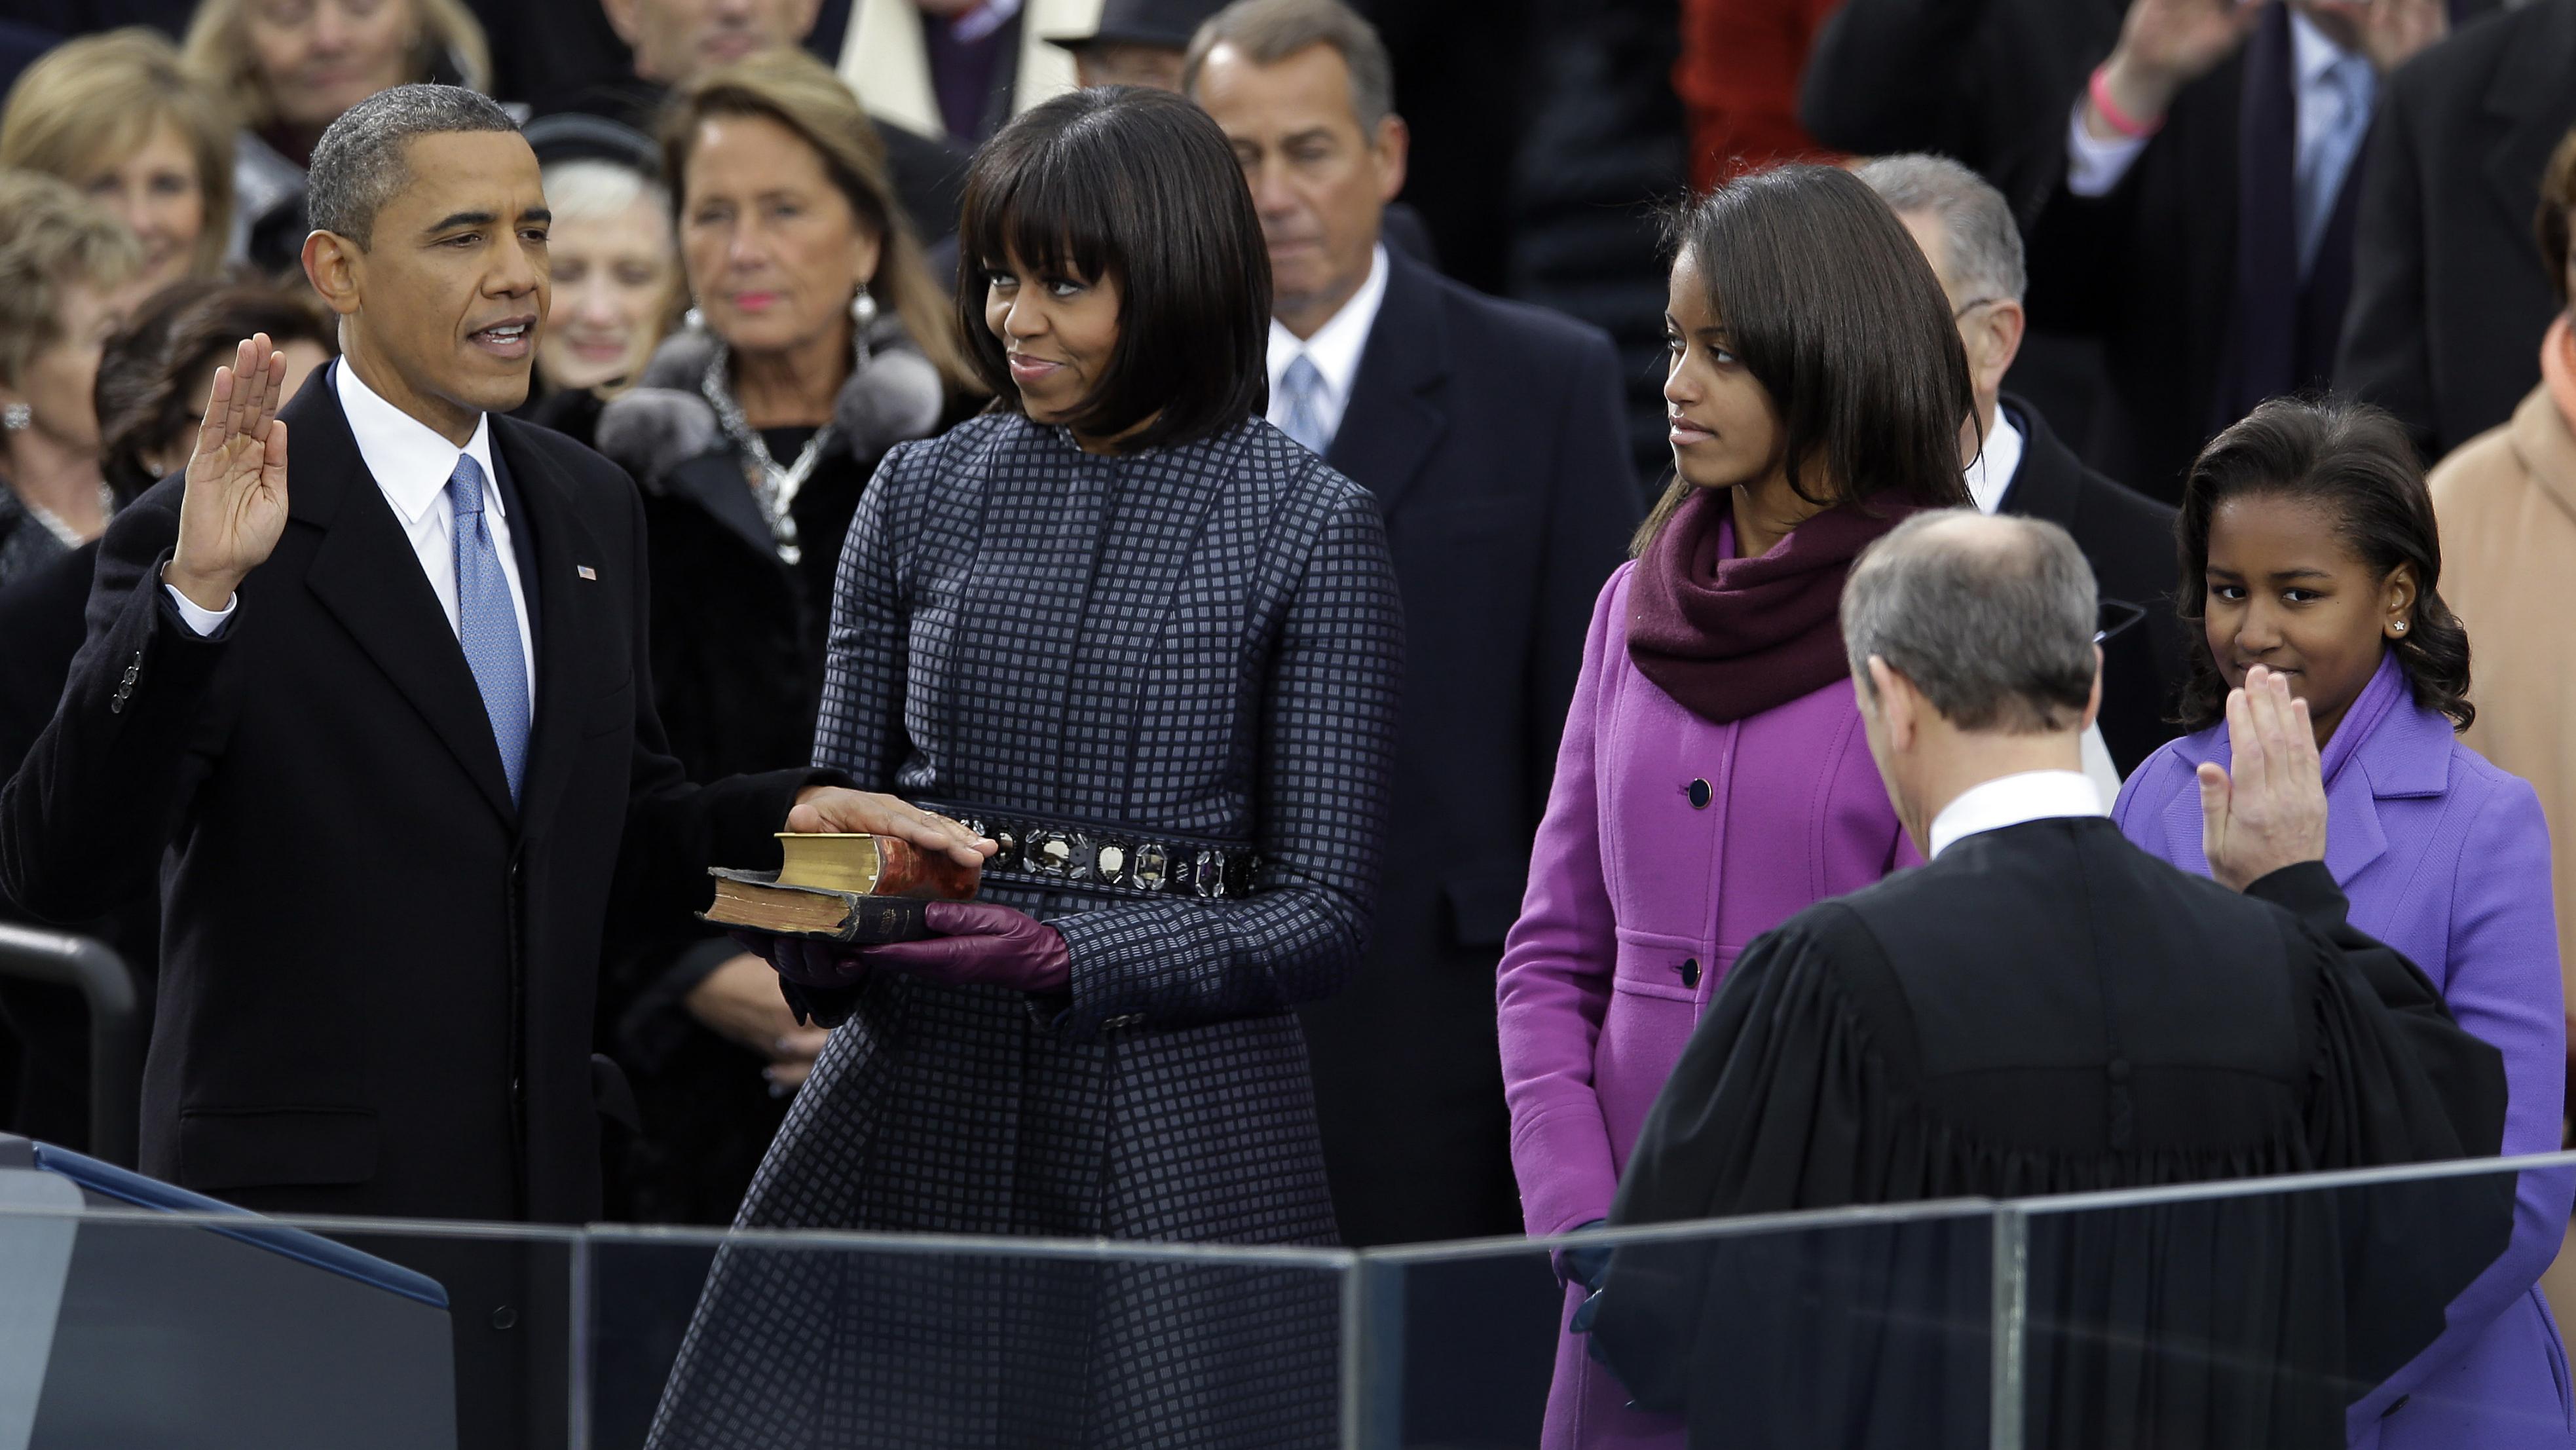 Obama second inauguration